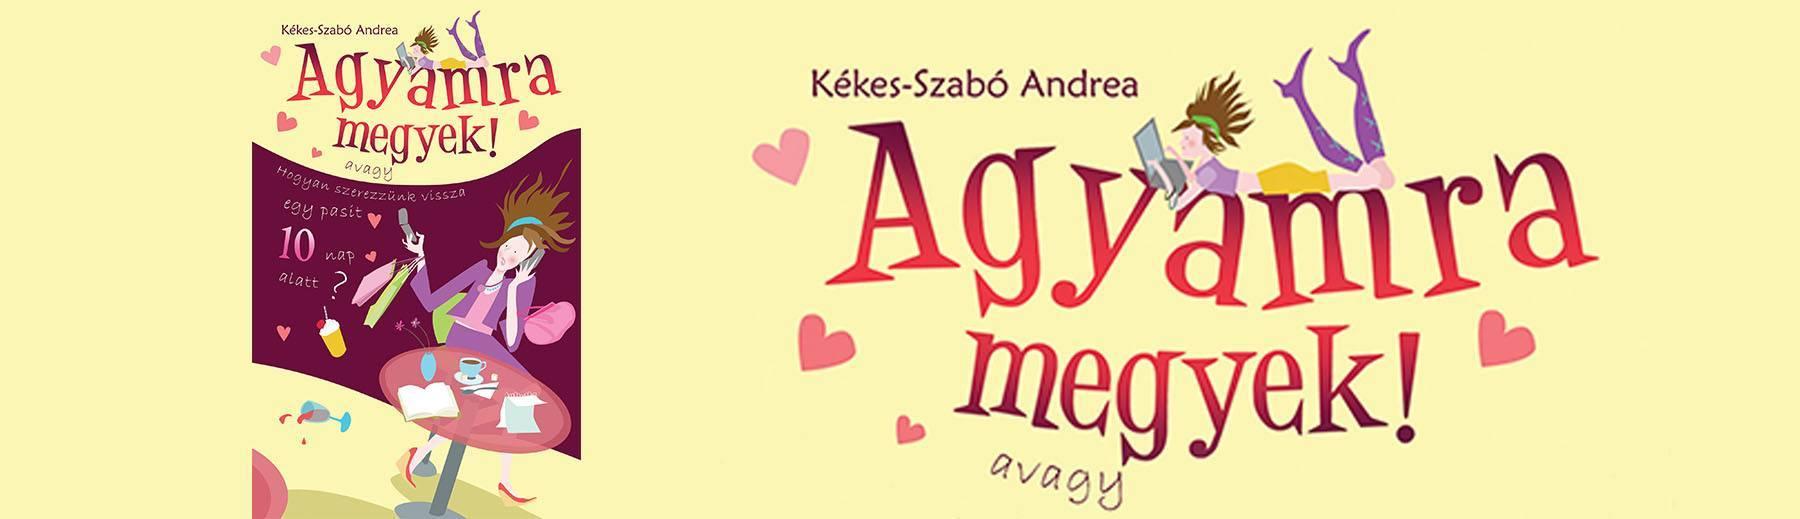 http://admin.konyvaruhaz.info/media/files/agyamra.jpg